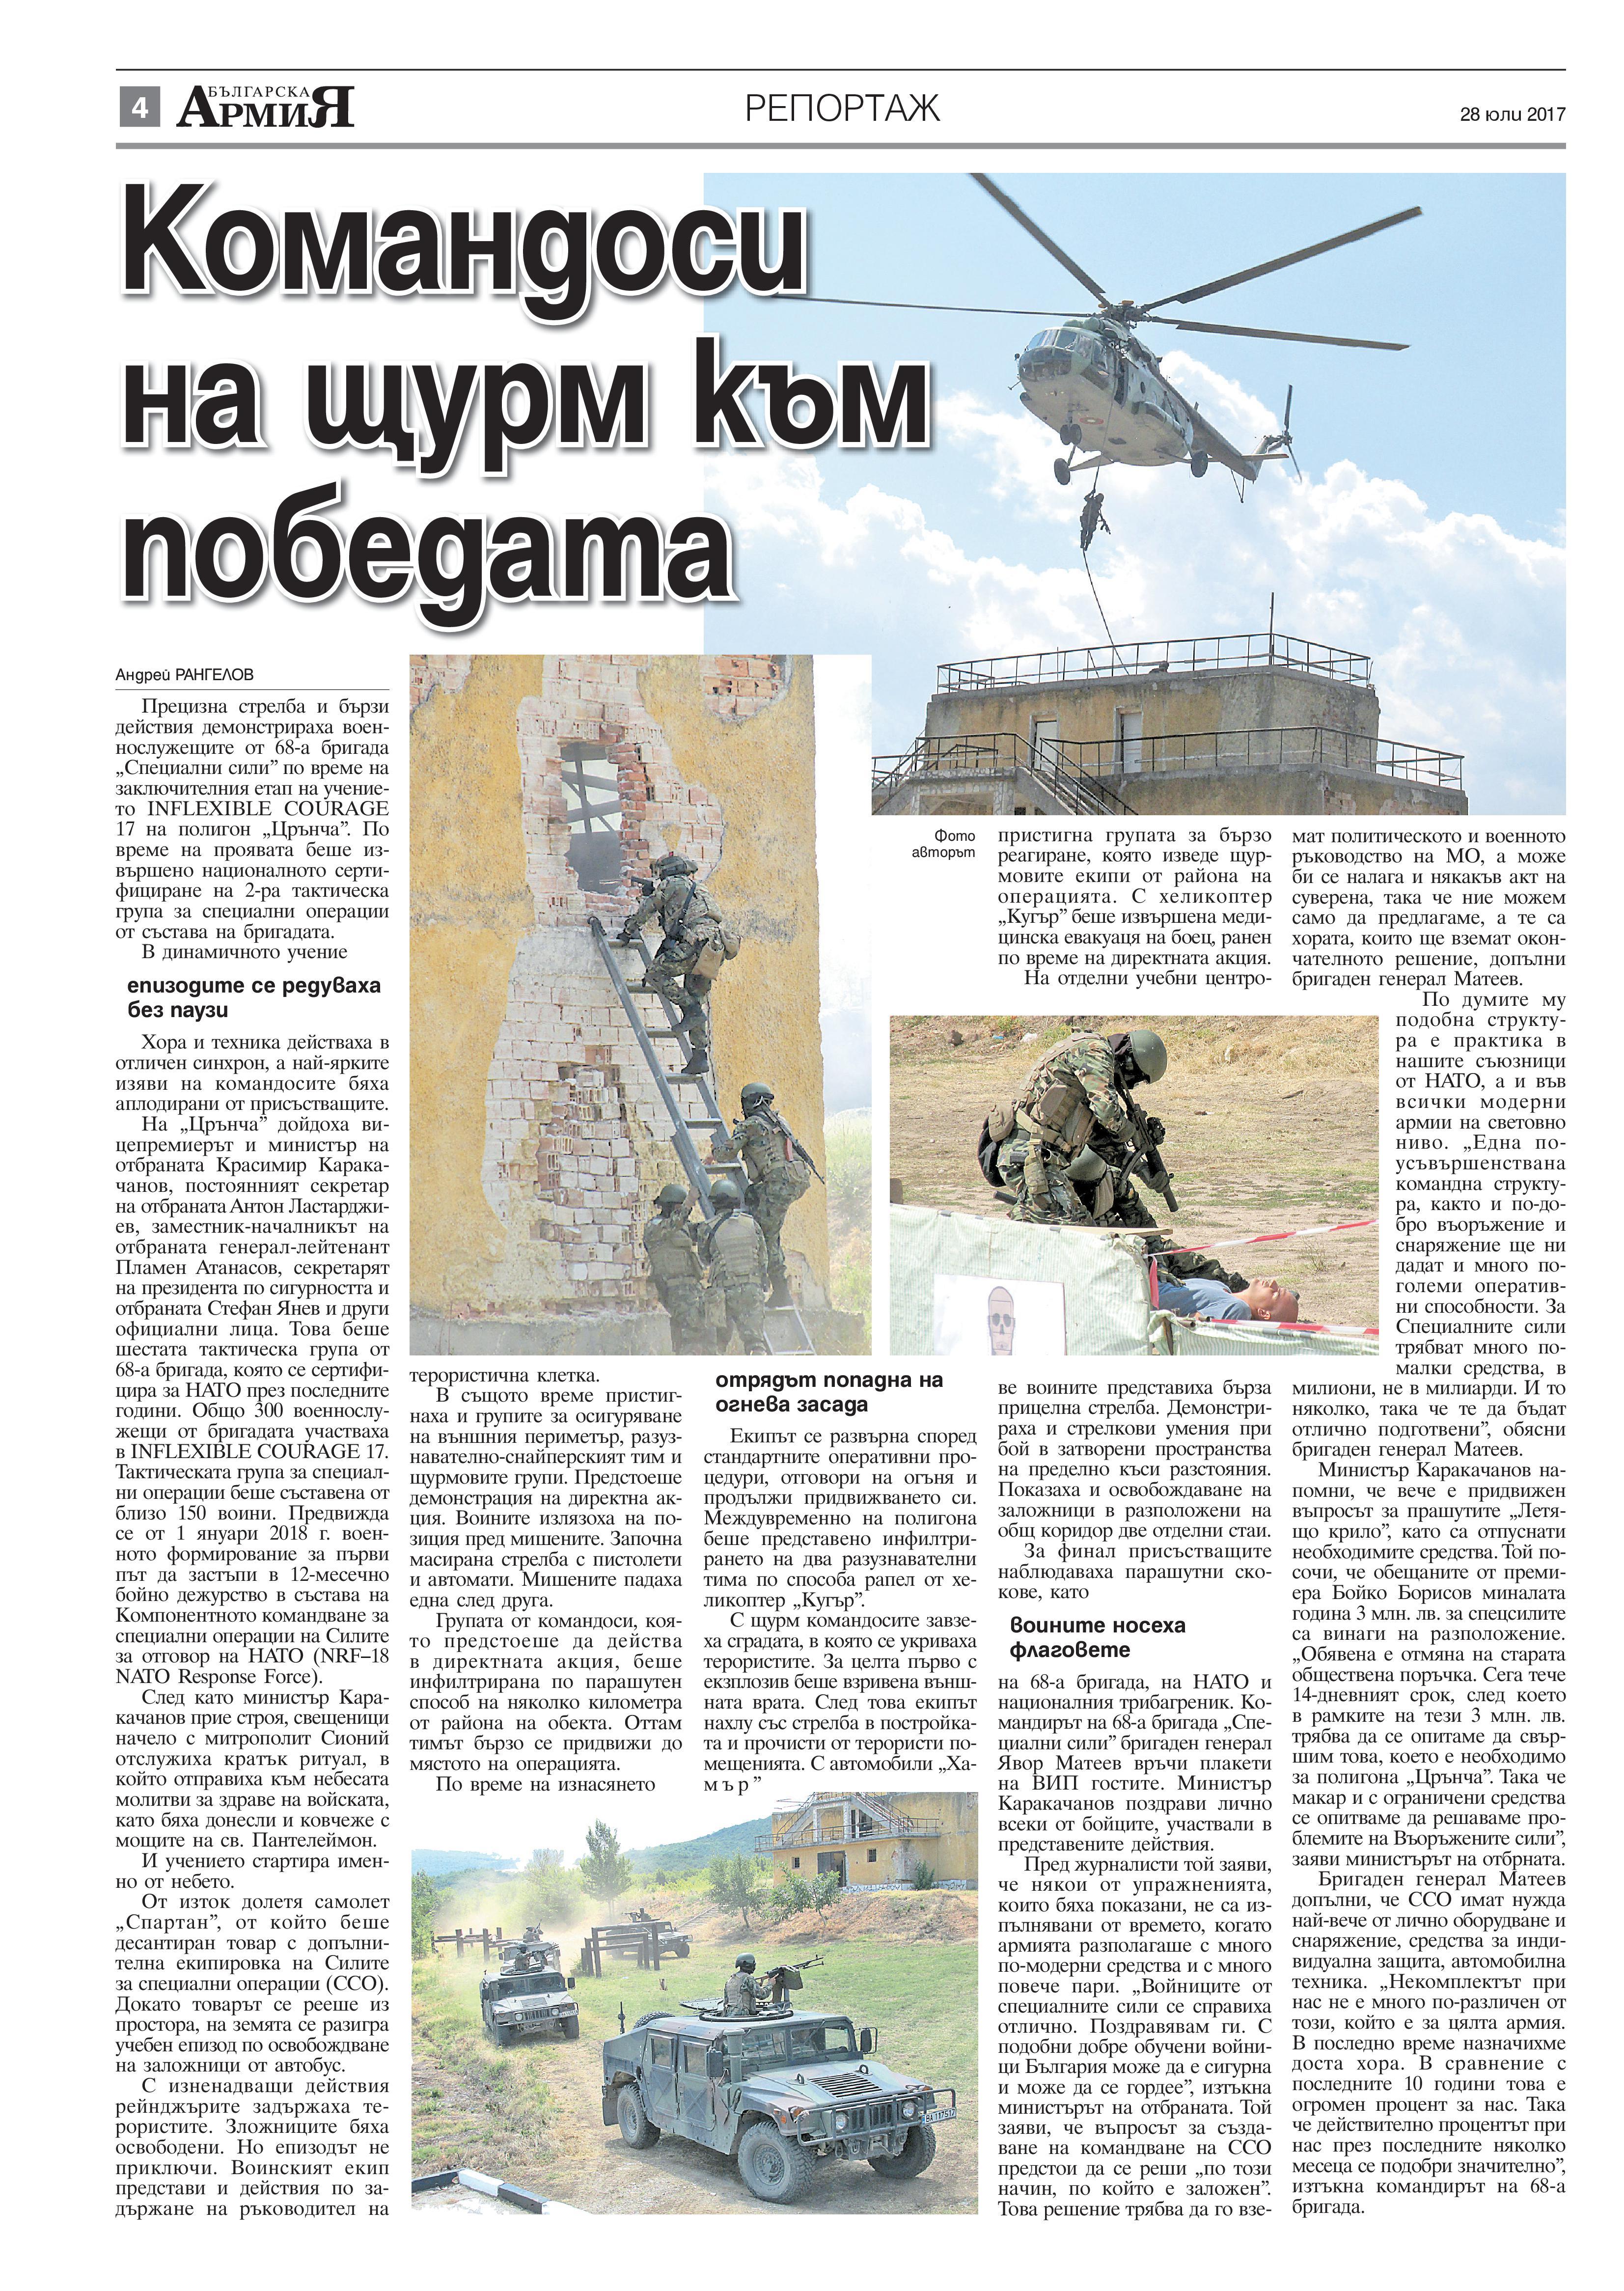 https://www.armymedia.bg/wp-content/uploads/2015/06/04-6.jpg